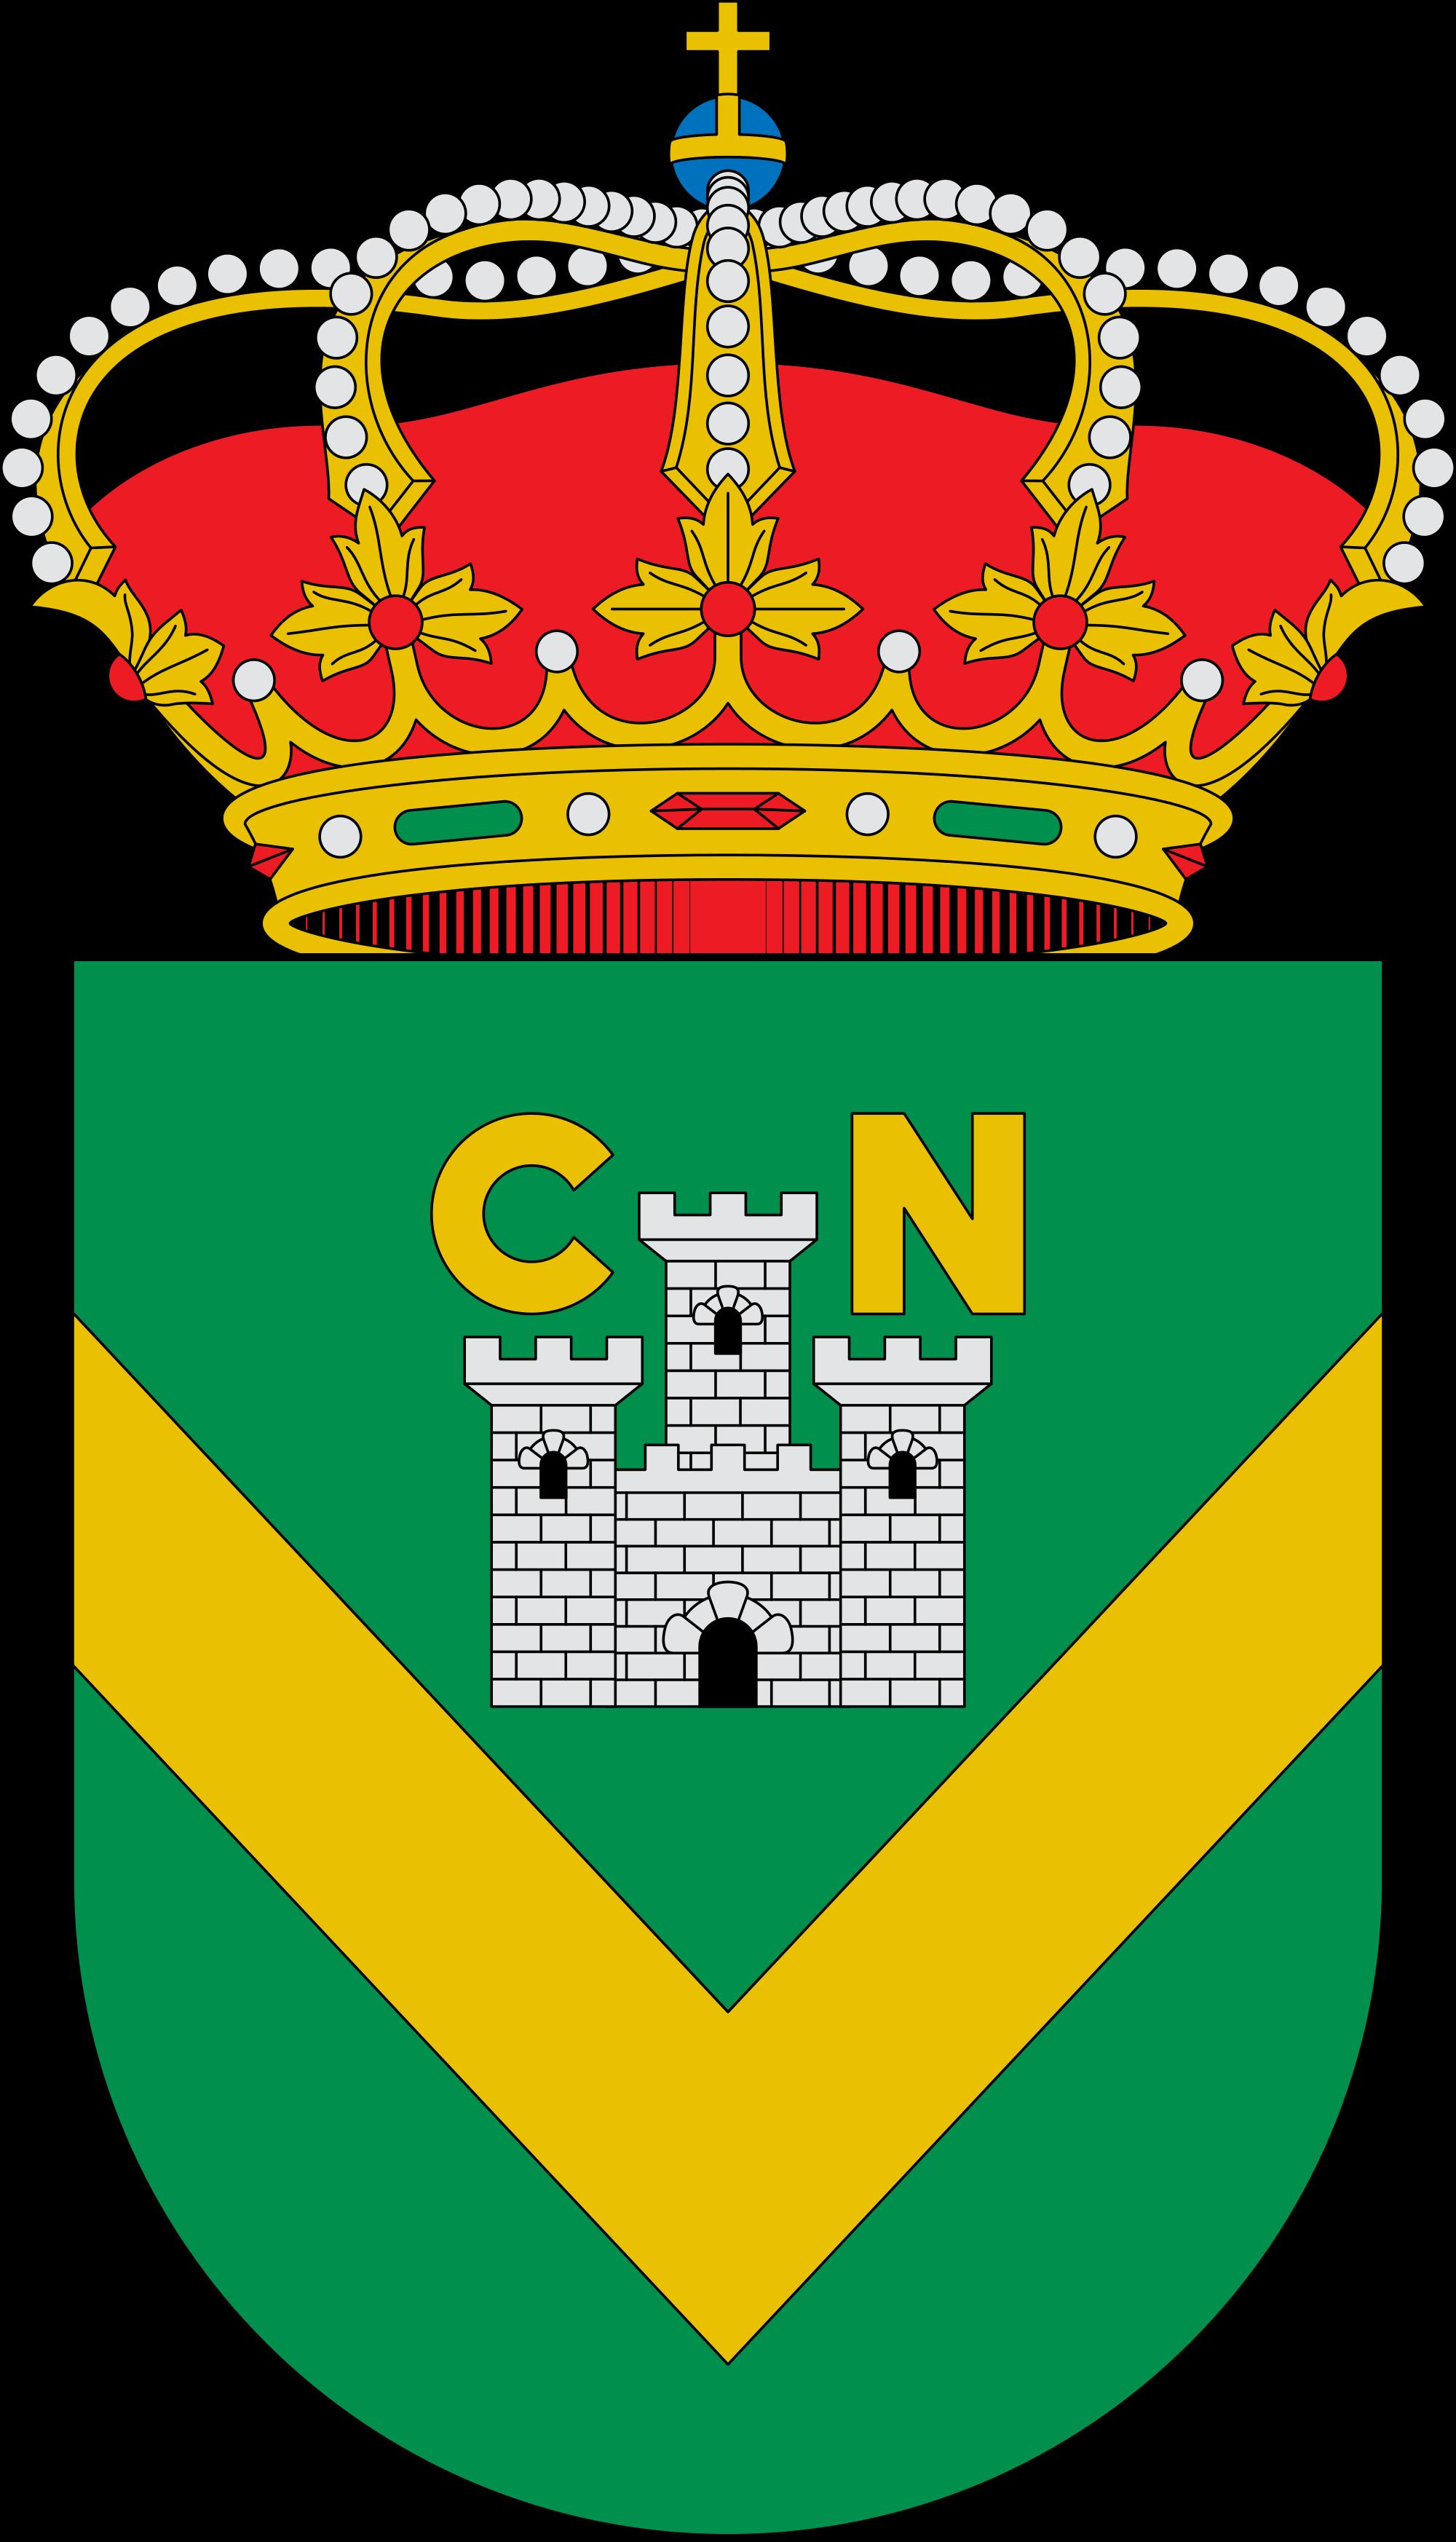 File:Escudo de Castelnou (Teruel).svg.